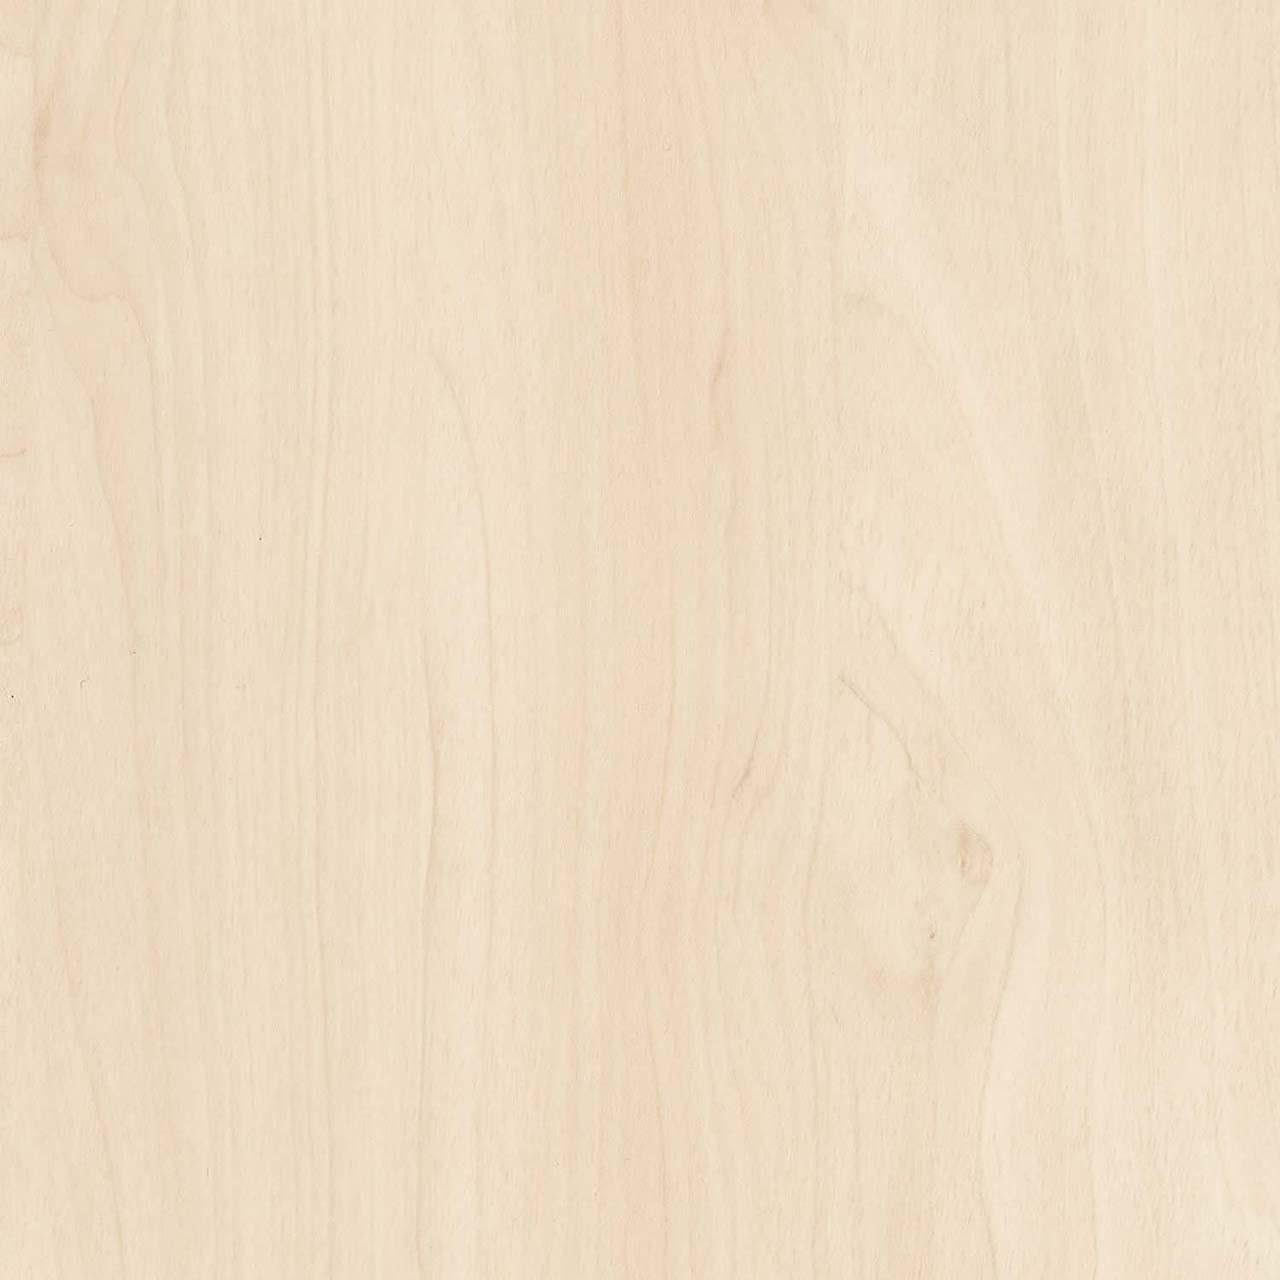 Minau Birch effect laminate panel